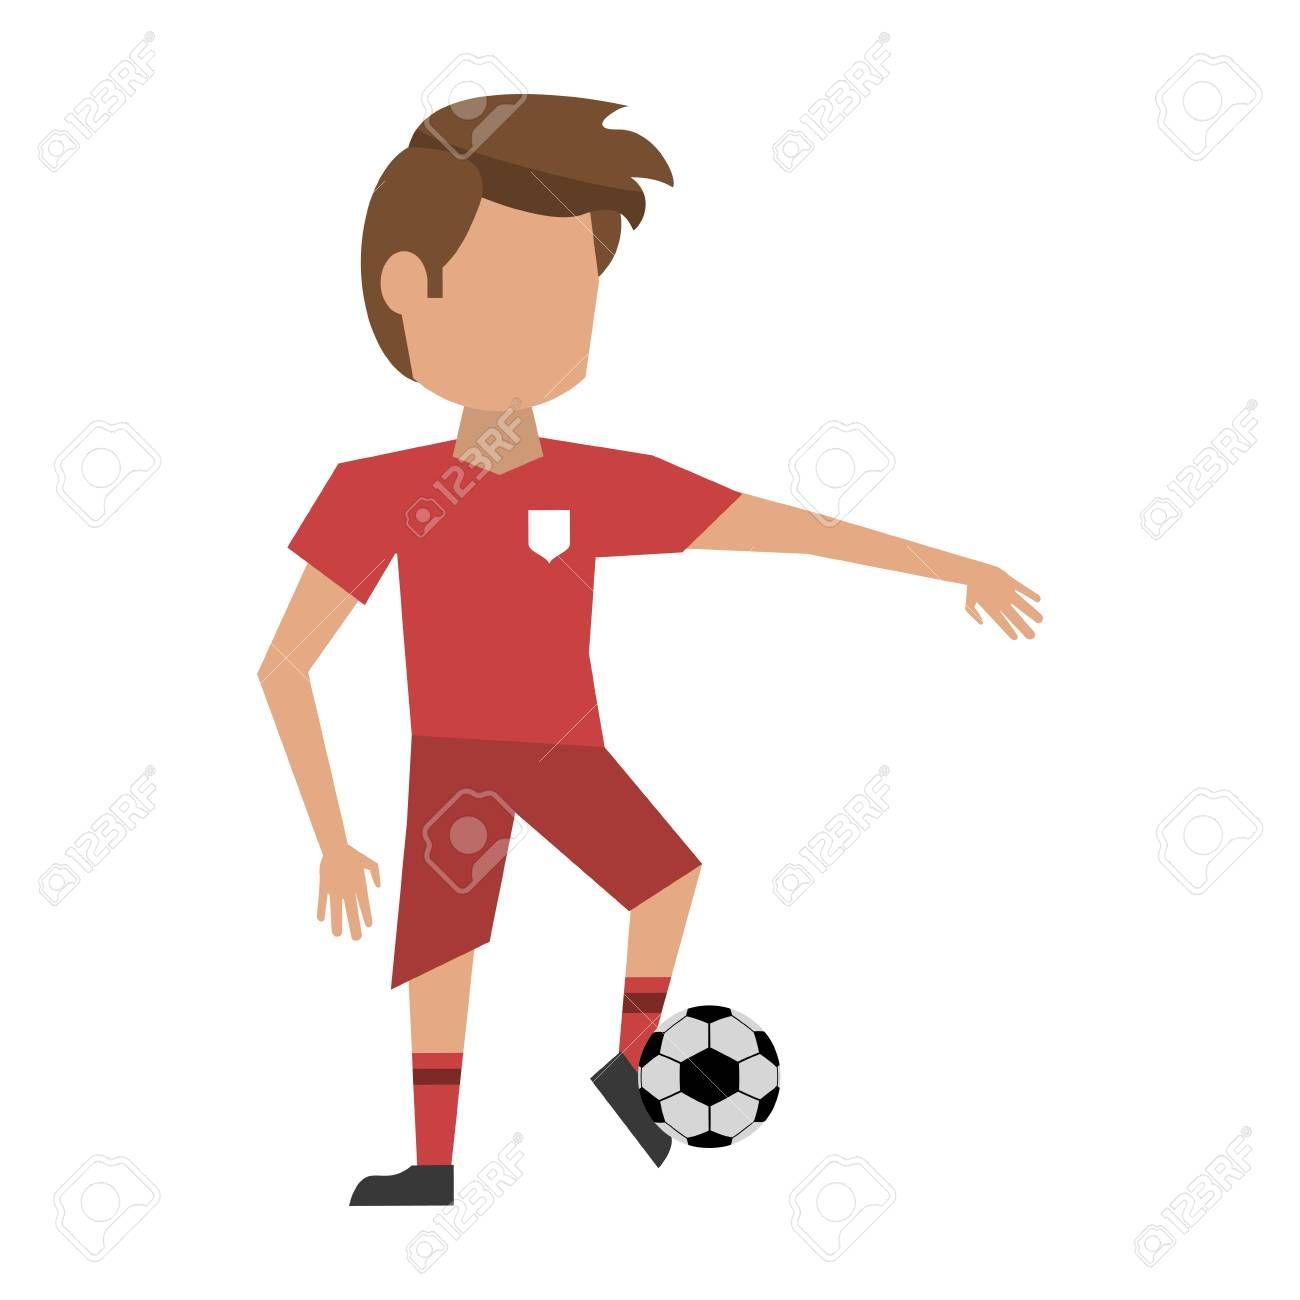 Soccer Player Cartoon Avatar Icon Vector Illustration Graphic Design Illustration Aff Avatar Ico In 2020 Graphic Design Illustration Illustration Design Cartoon